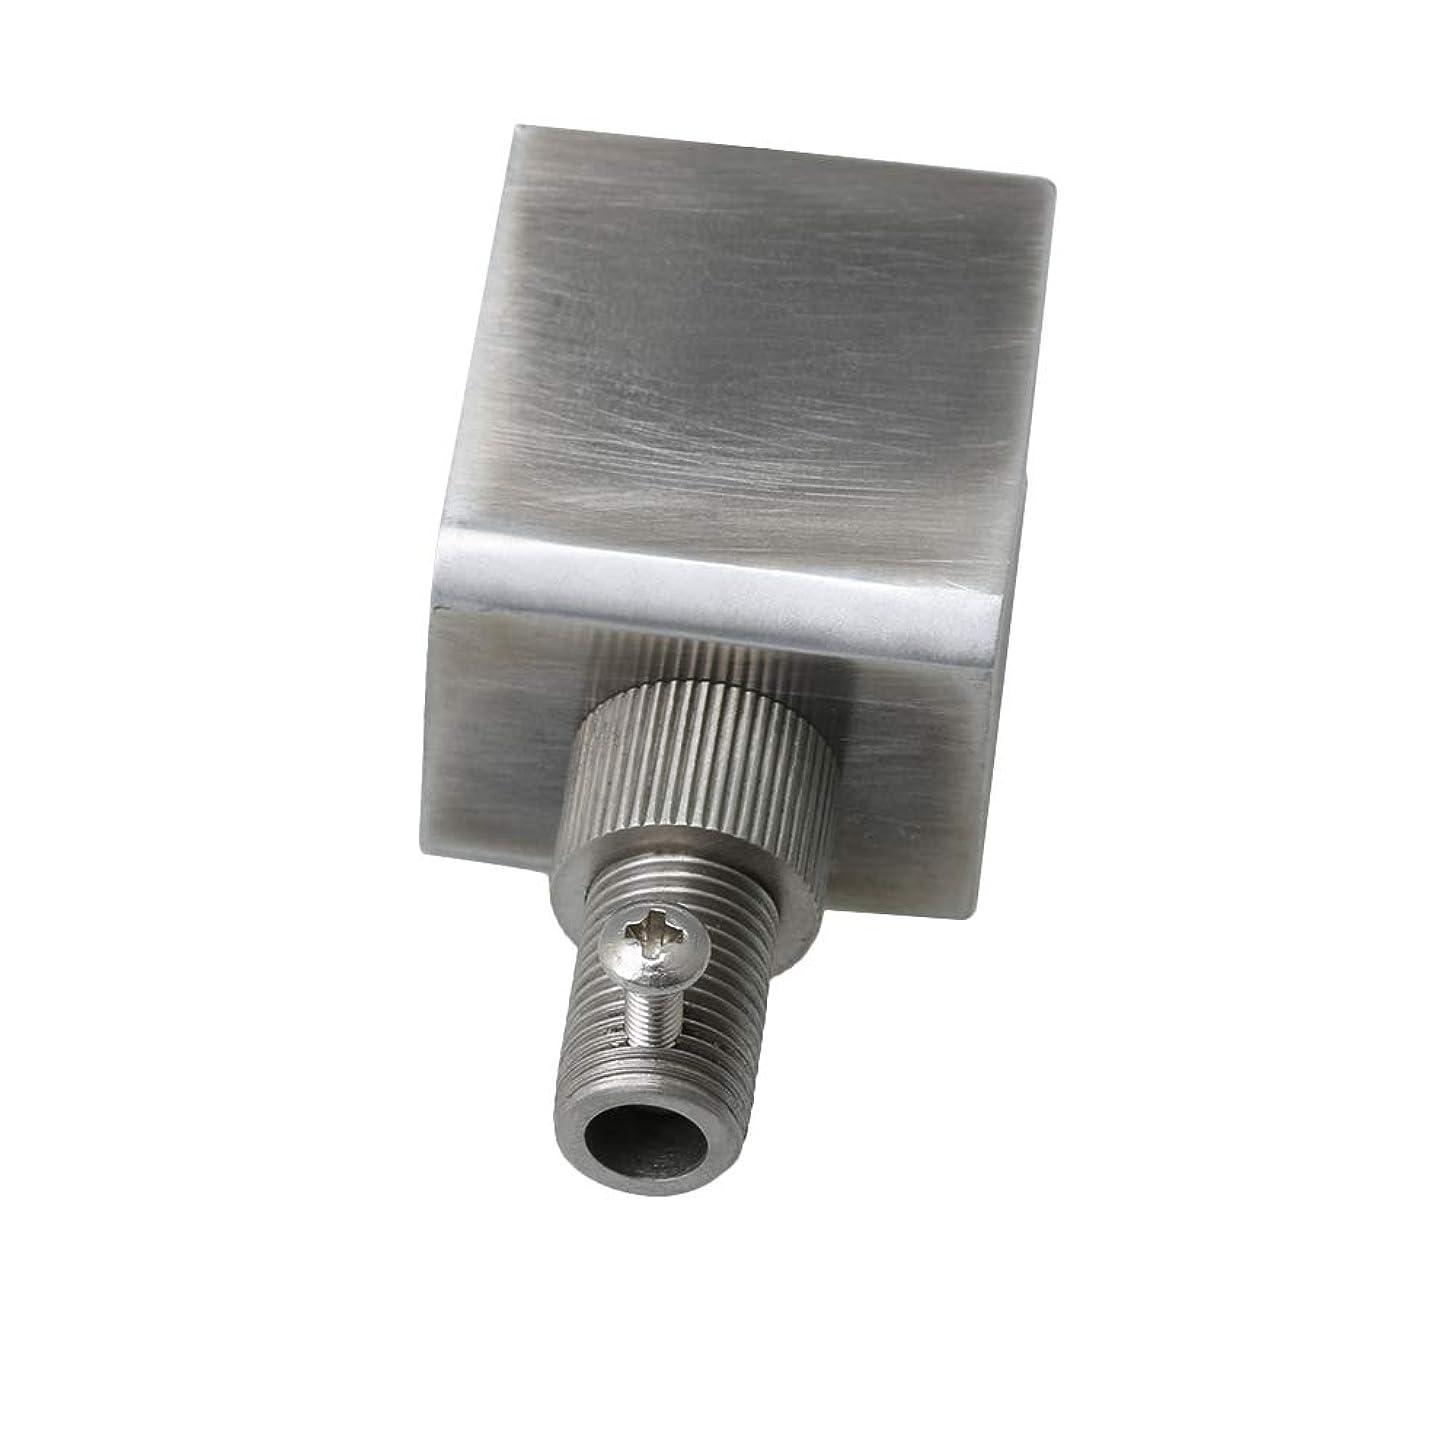 Mxfans Piano Key Measure Tool Leveling Device Piano Repair Tool Aluminum Silver